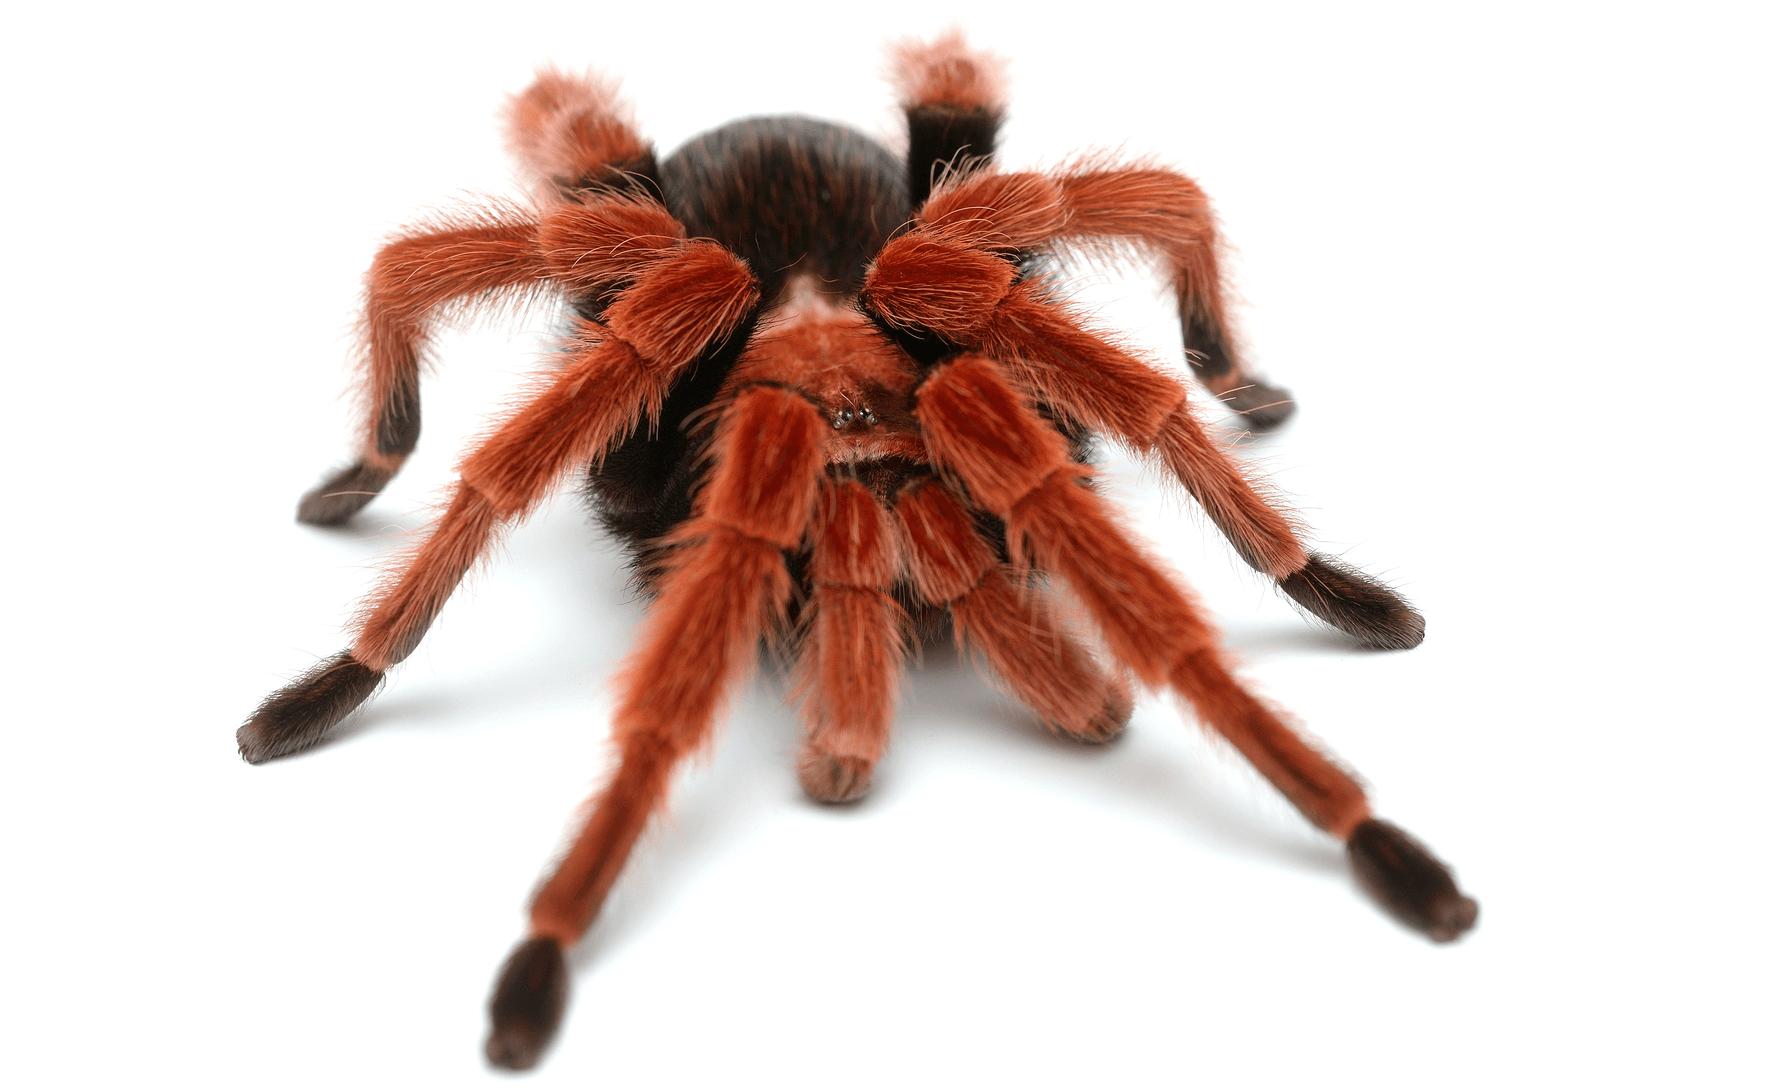 Do male tarantulas die early?